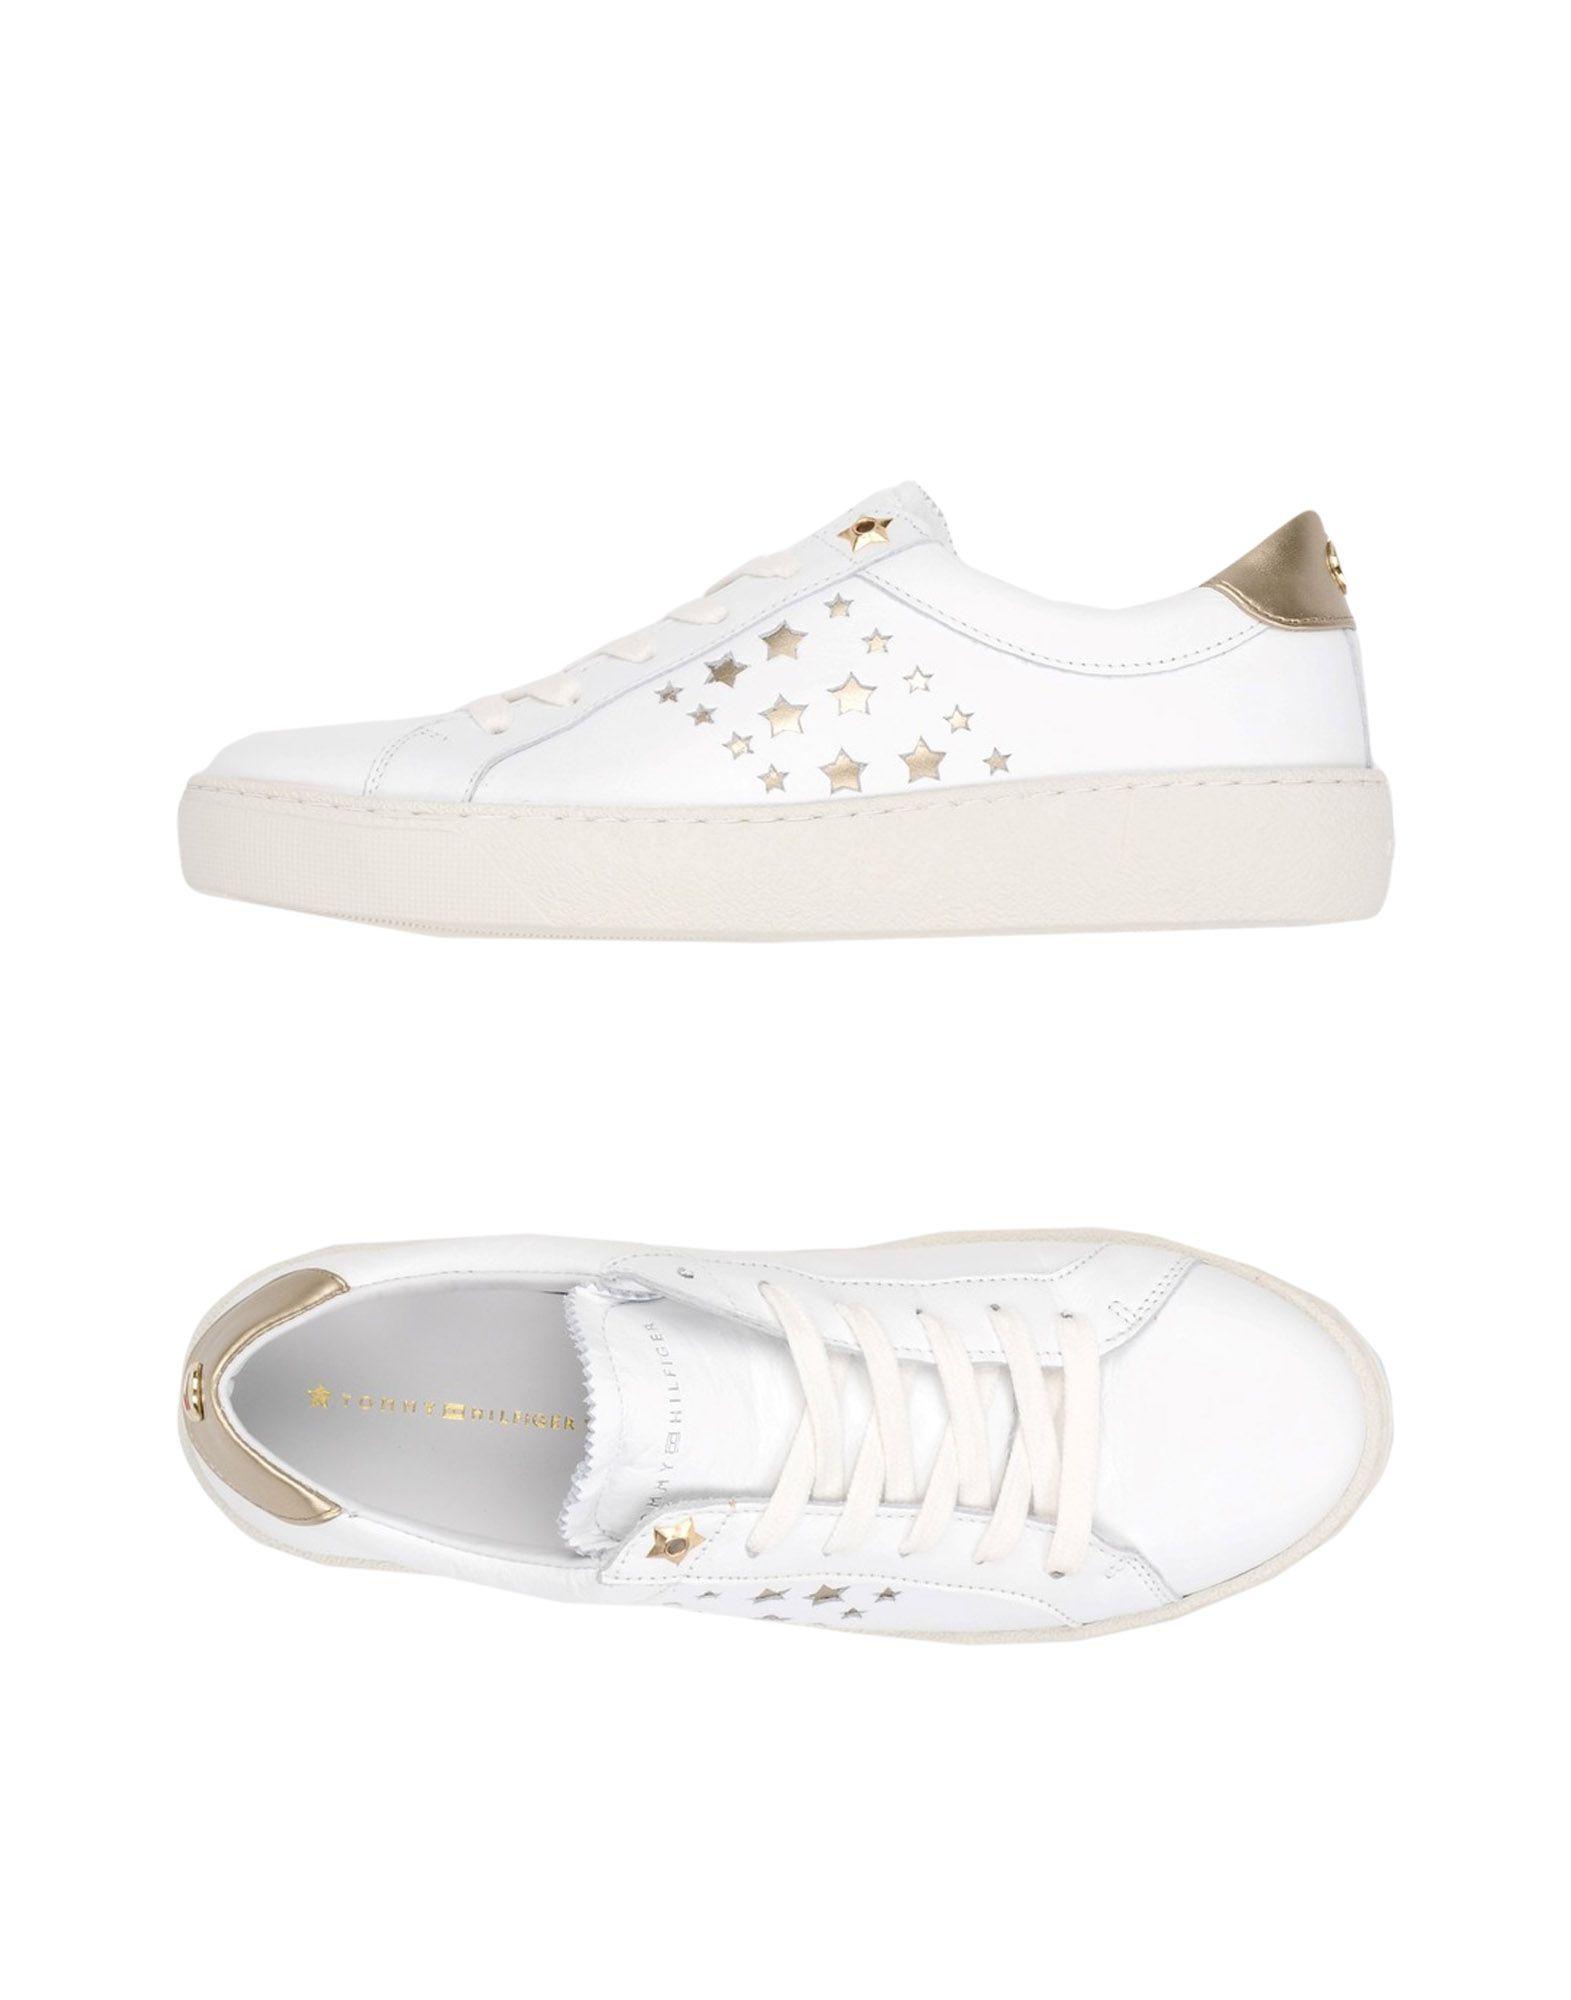 Stilvolle billige Schuhe Tommy Hilfiger 11417560CT Sneakers Damen  11417560CT Hilfiger 4e314d